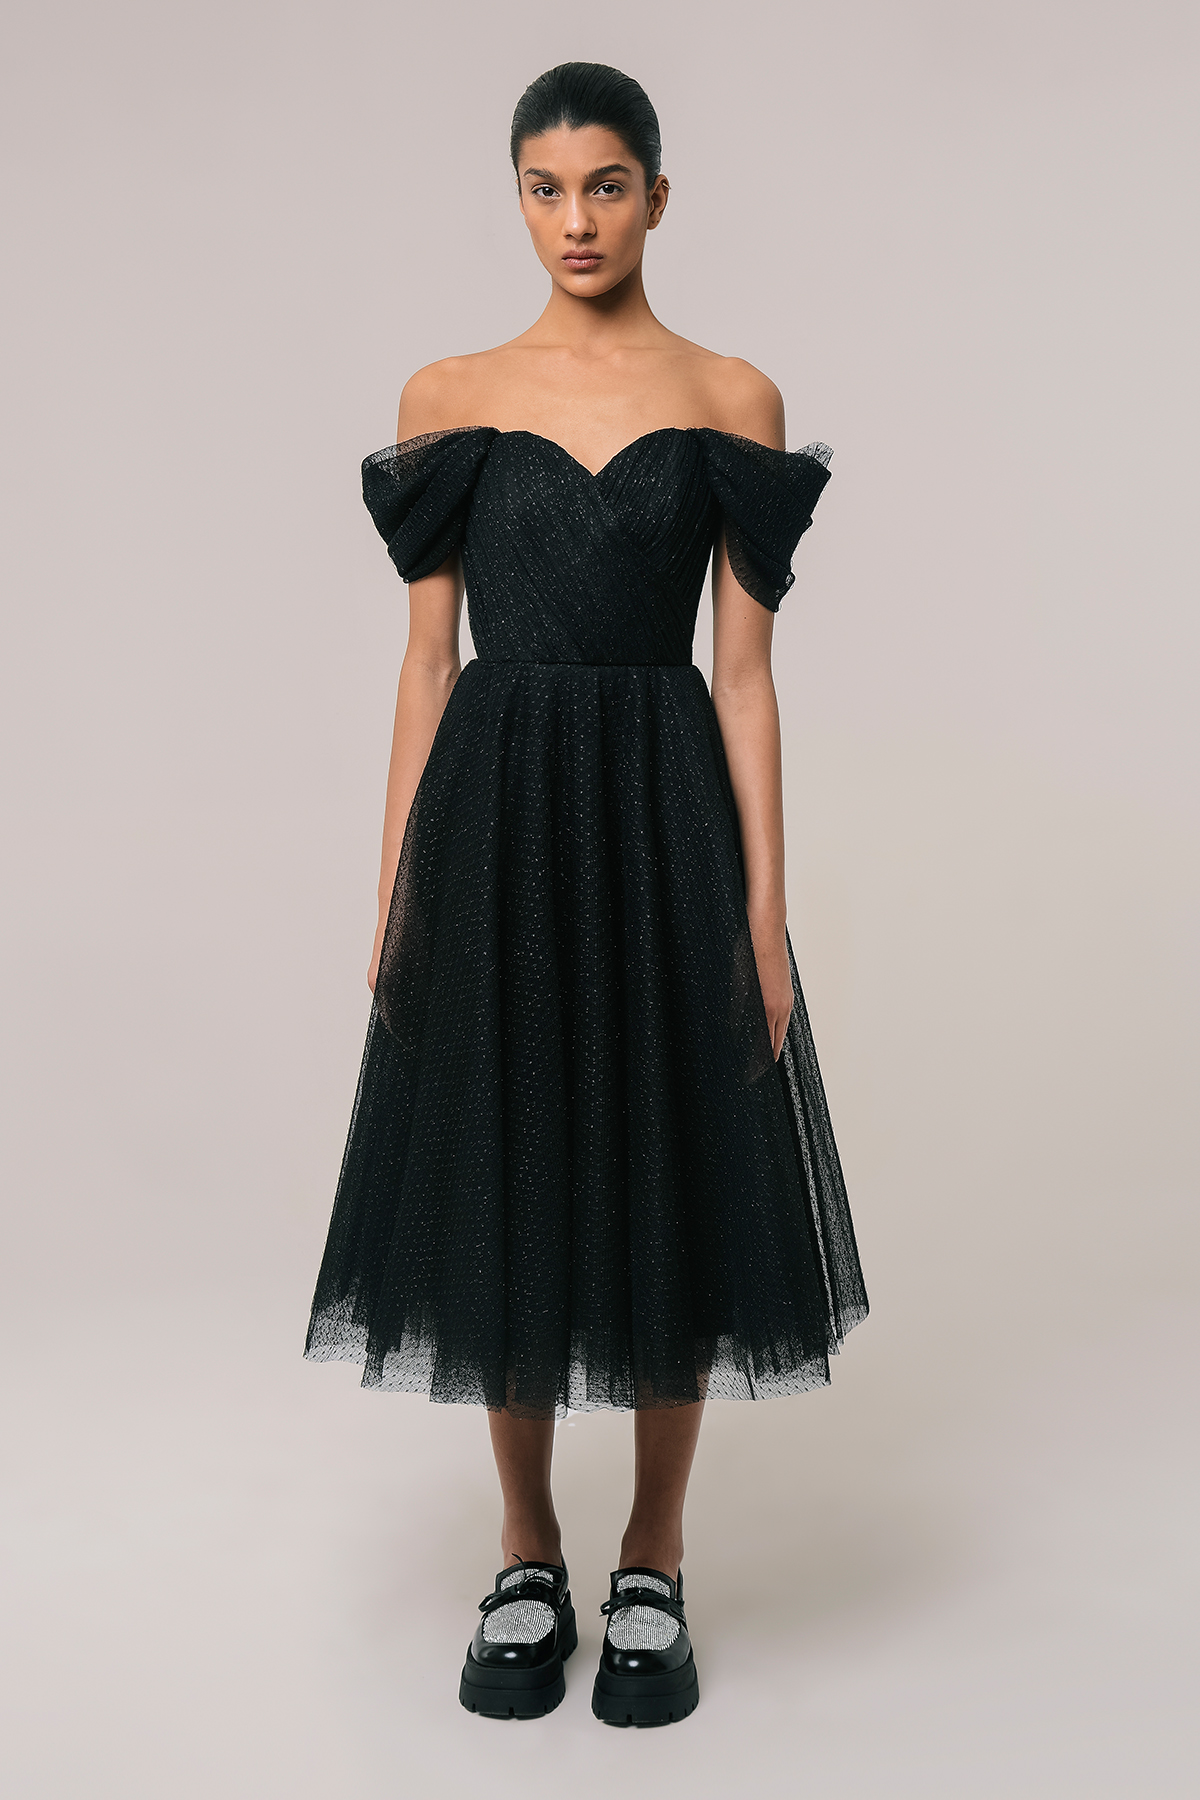 Corset style tulle dress